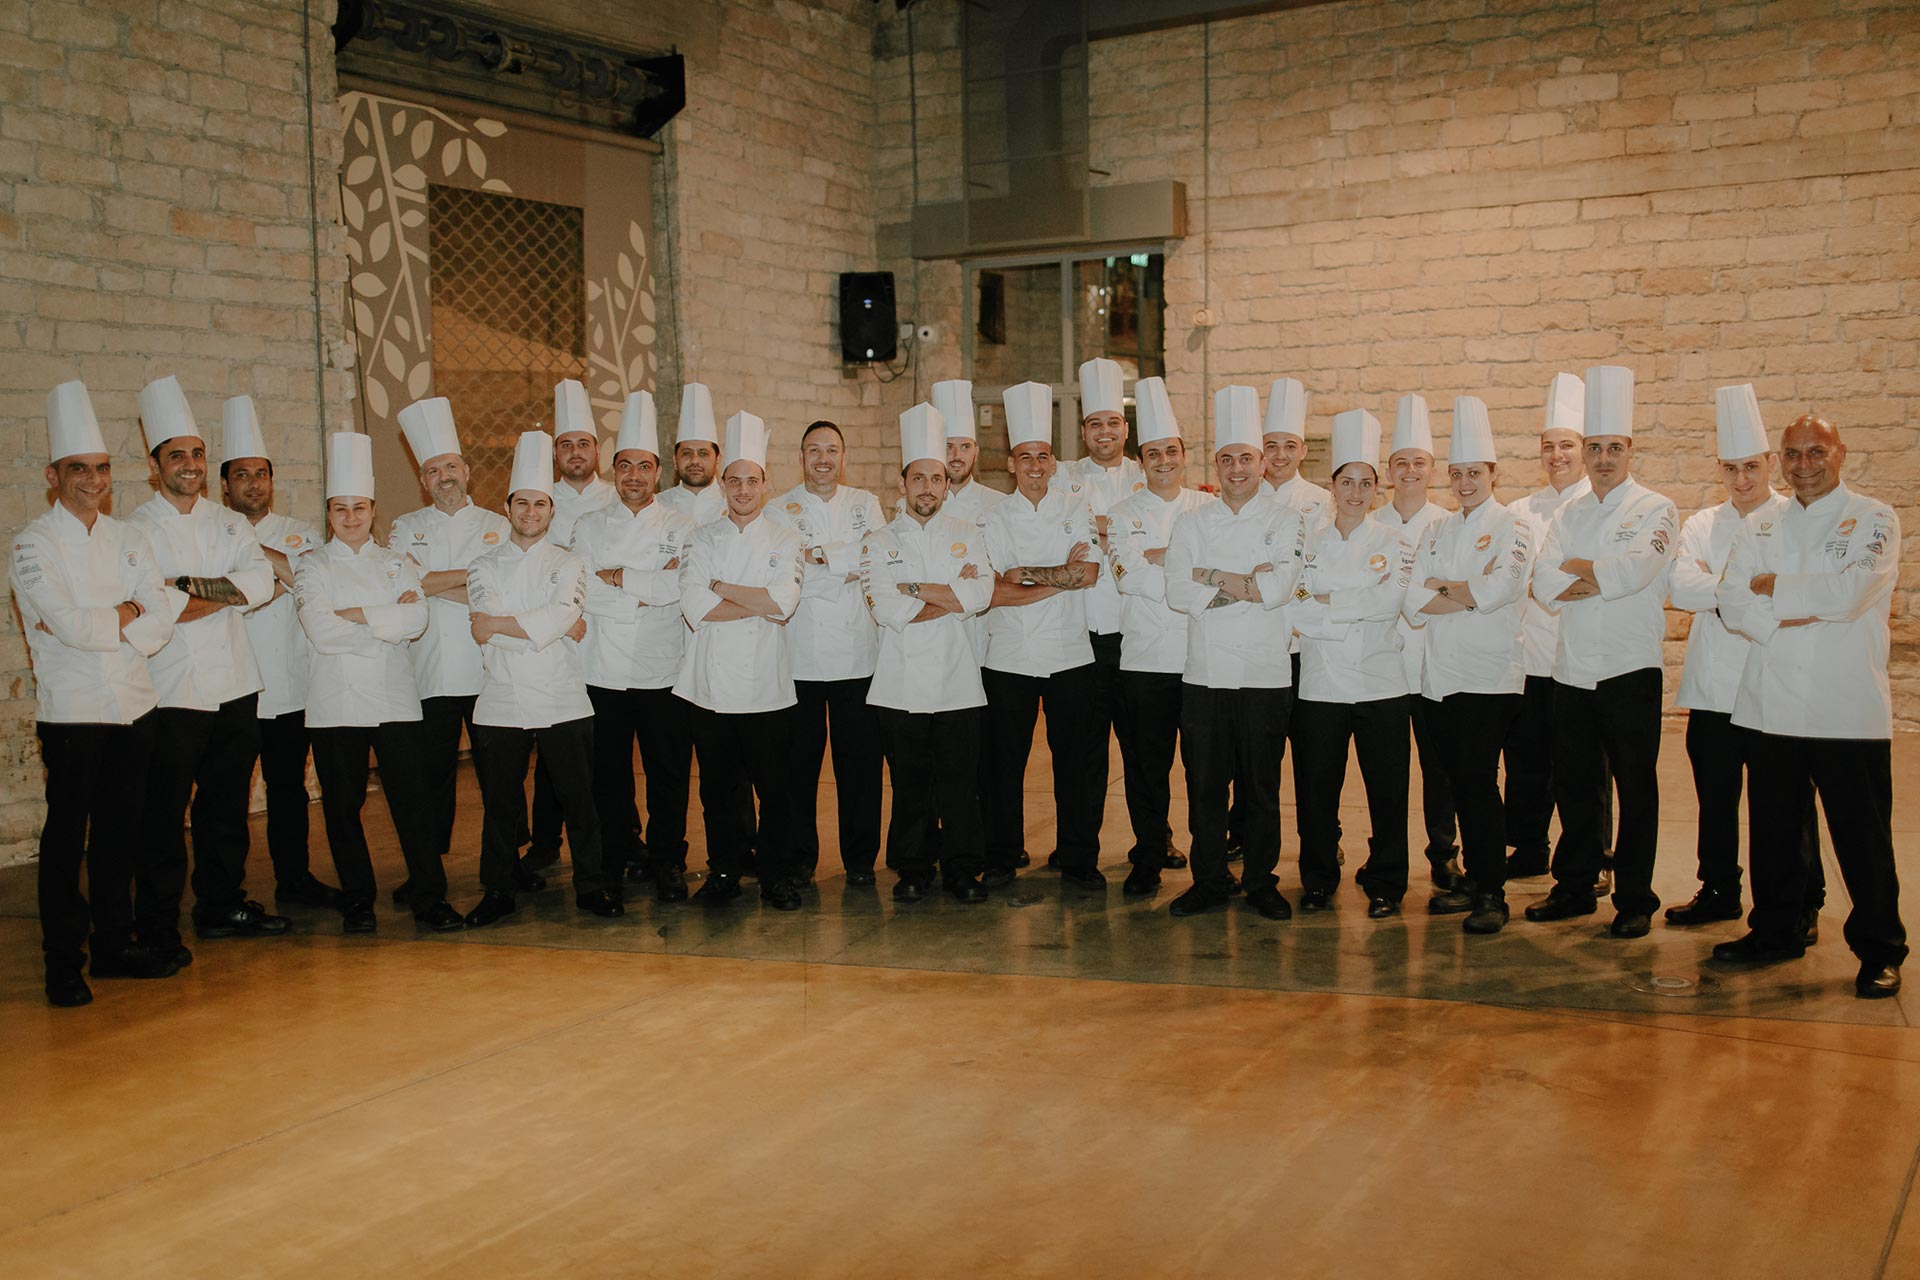 Cyprus Chefs Association - National Team Members